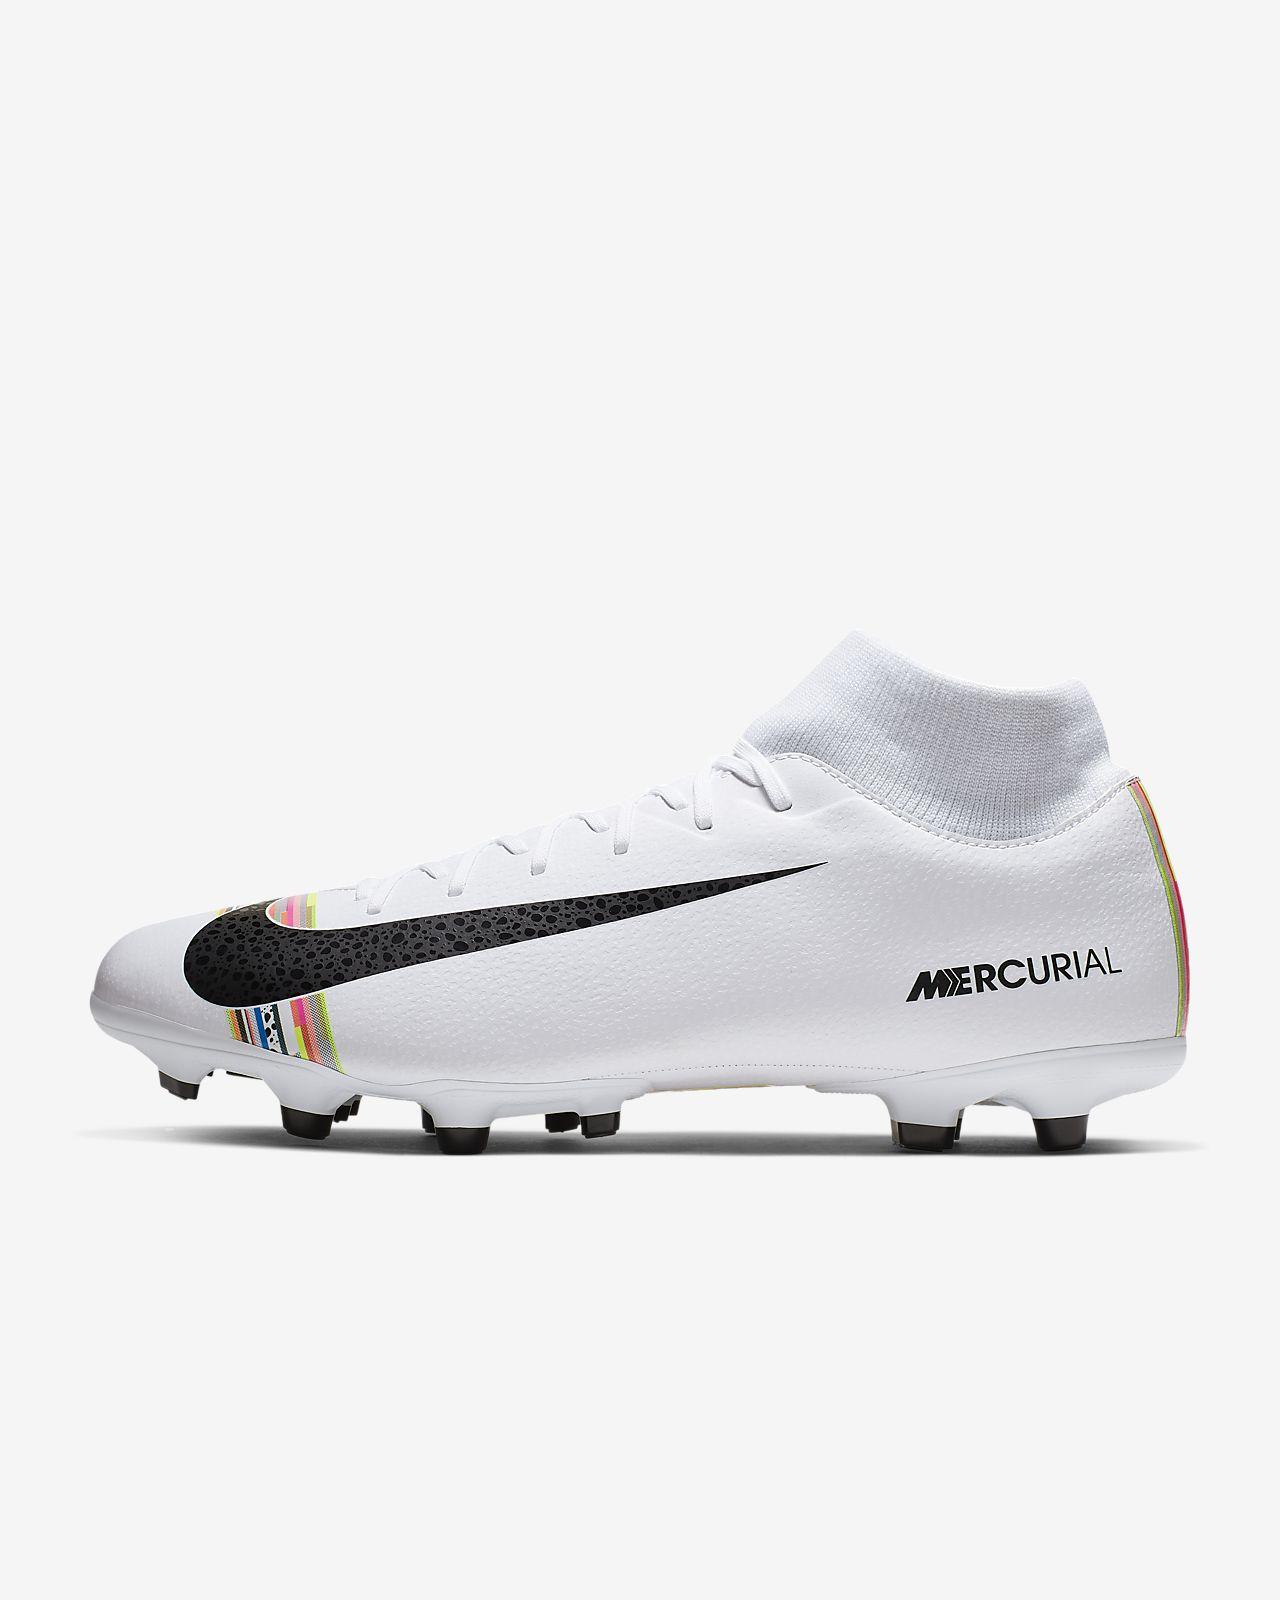 100% authentic 66846 50a79 ... Nike Mercurial Superfly 6 Academy LVL UP MG Voetbalschoen (meerdere  ondergronden)